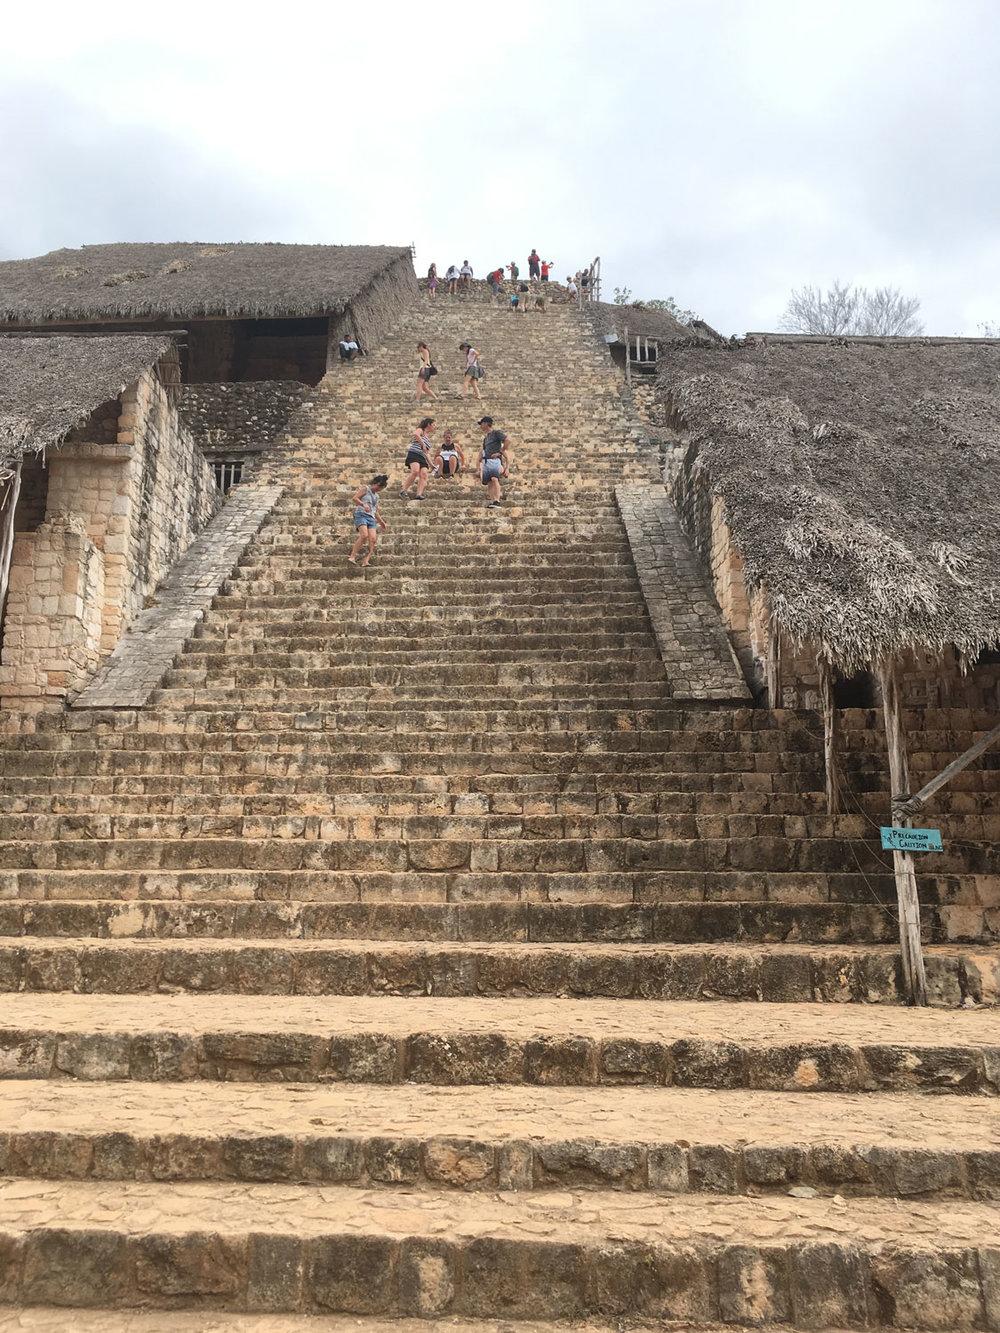 Hammocks_and_Ruins_Blog_Riviera_Maya_Mexico_Travel_Discover_Explore_Yucatan_Pyramid_Temple_Ek_Balam_24.jpg